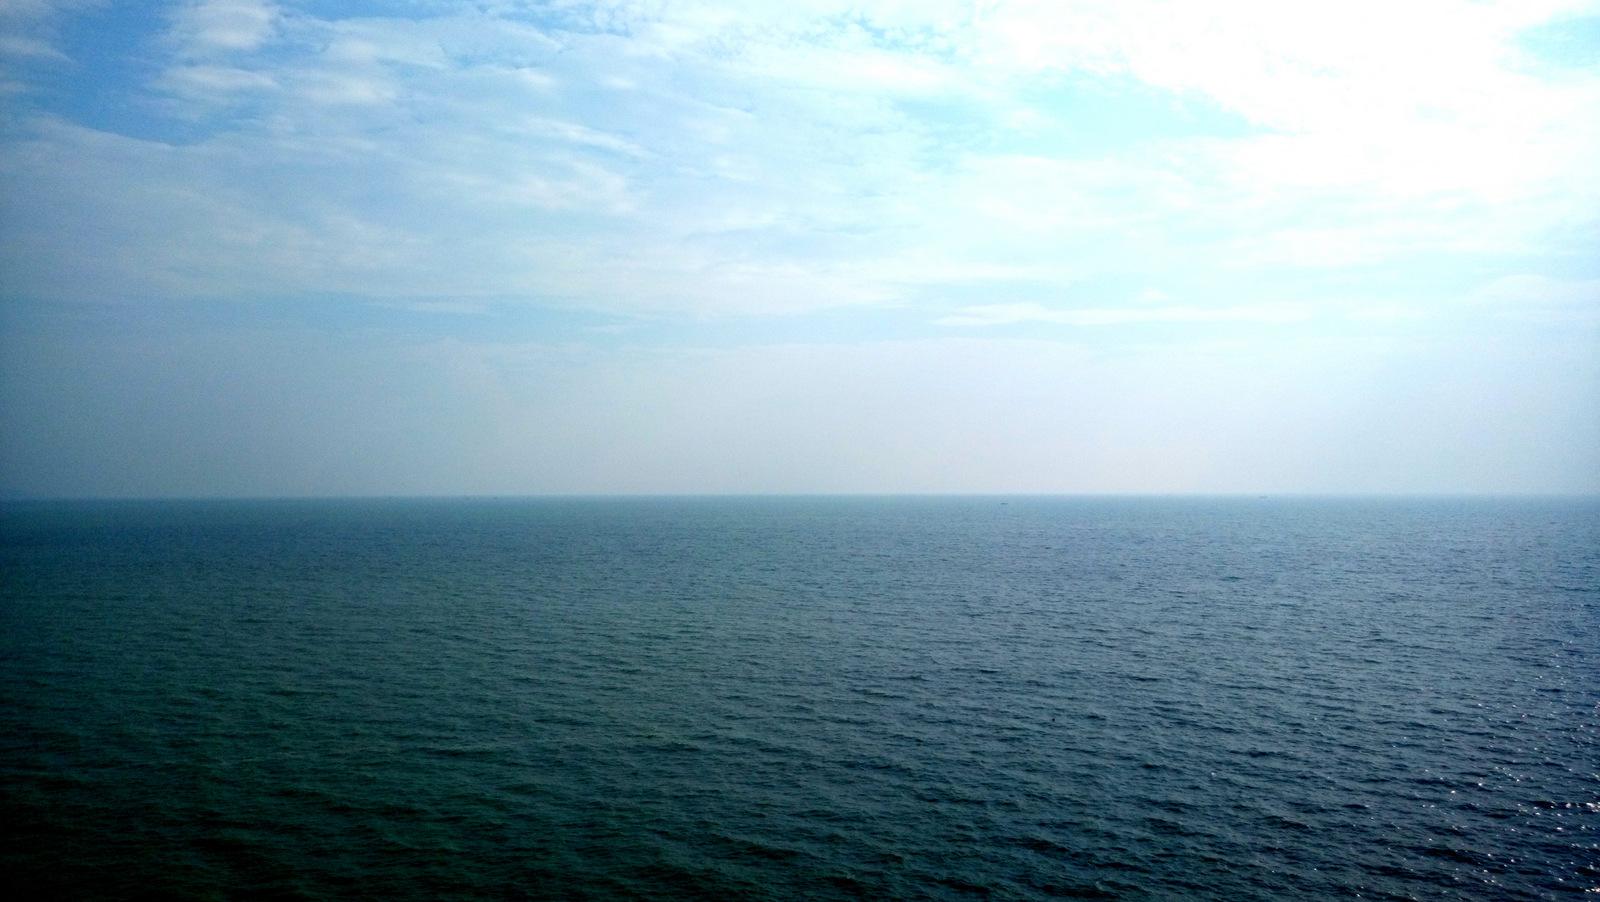 Arabian Sea, Gokarna, Karnataka, India